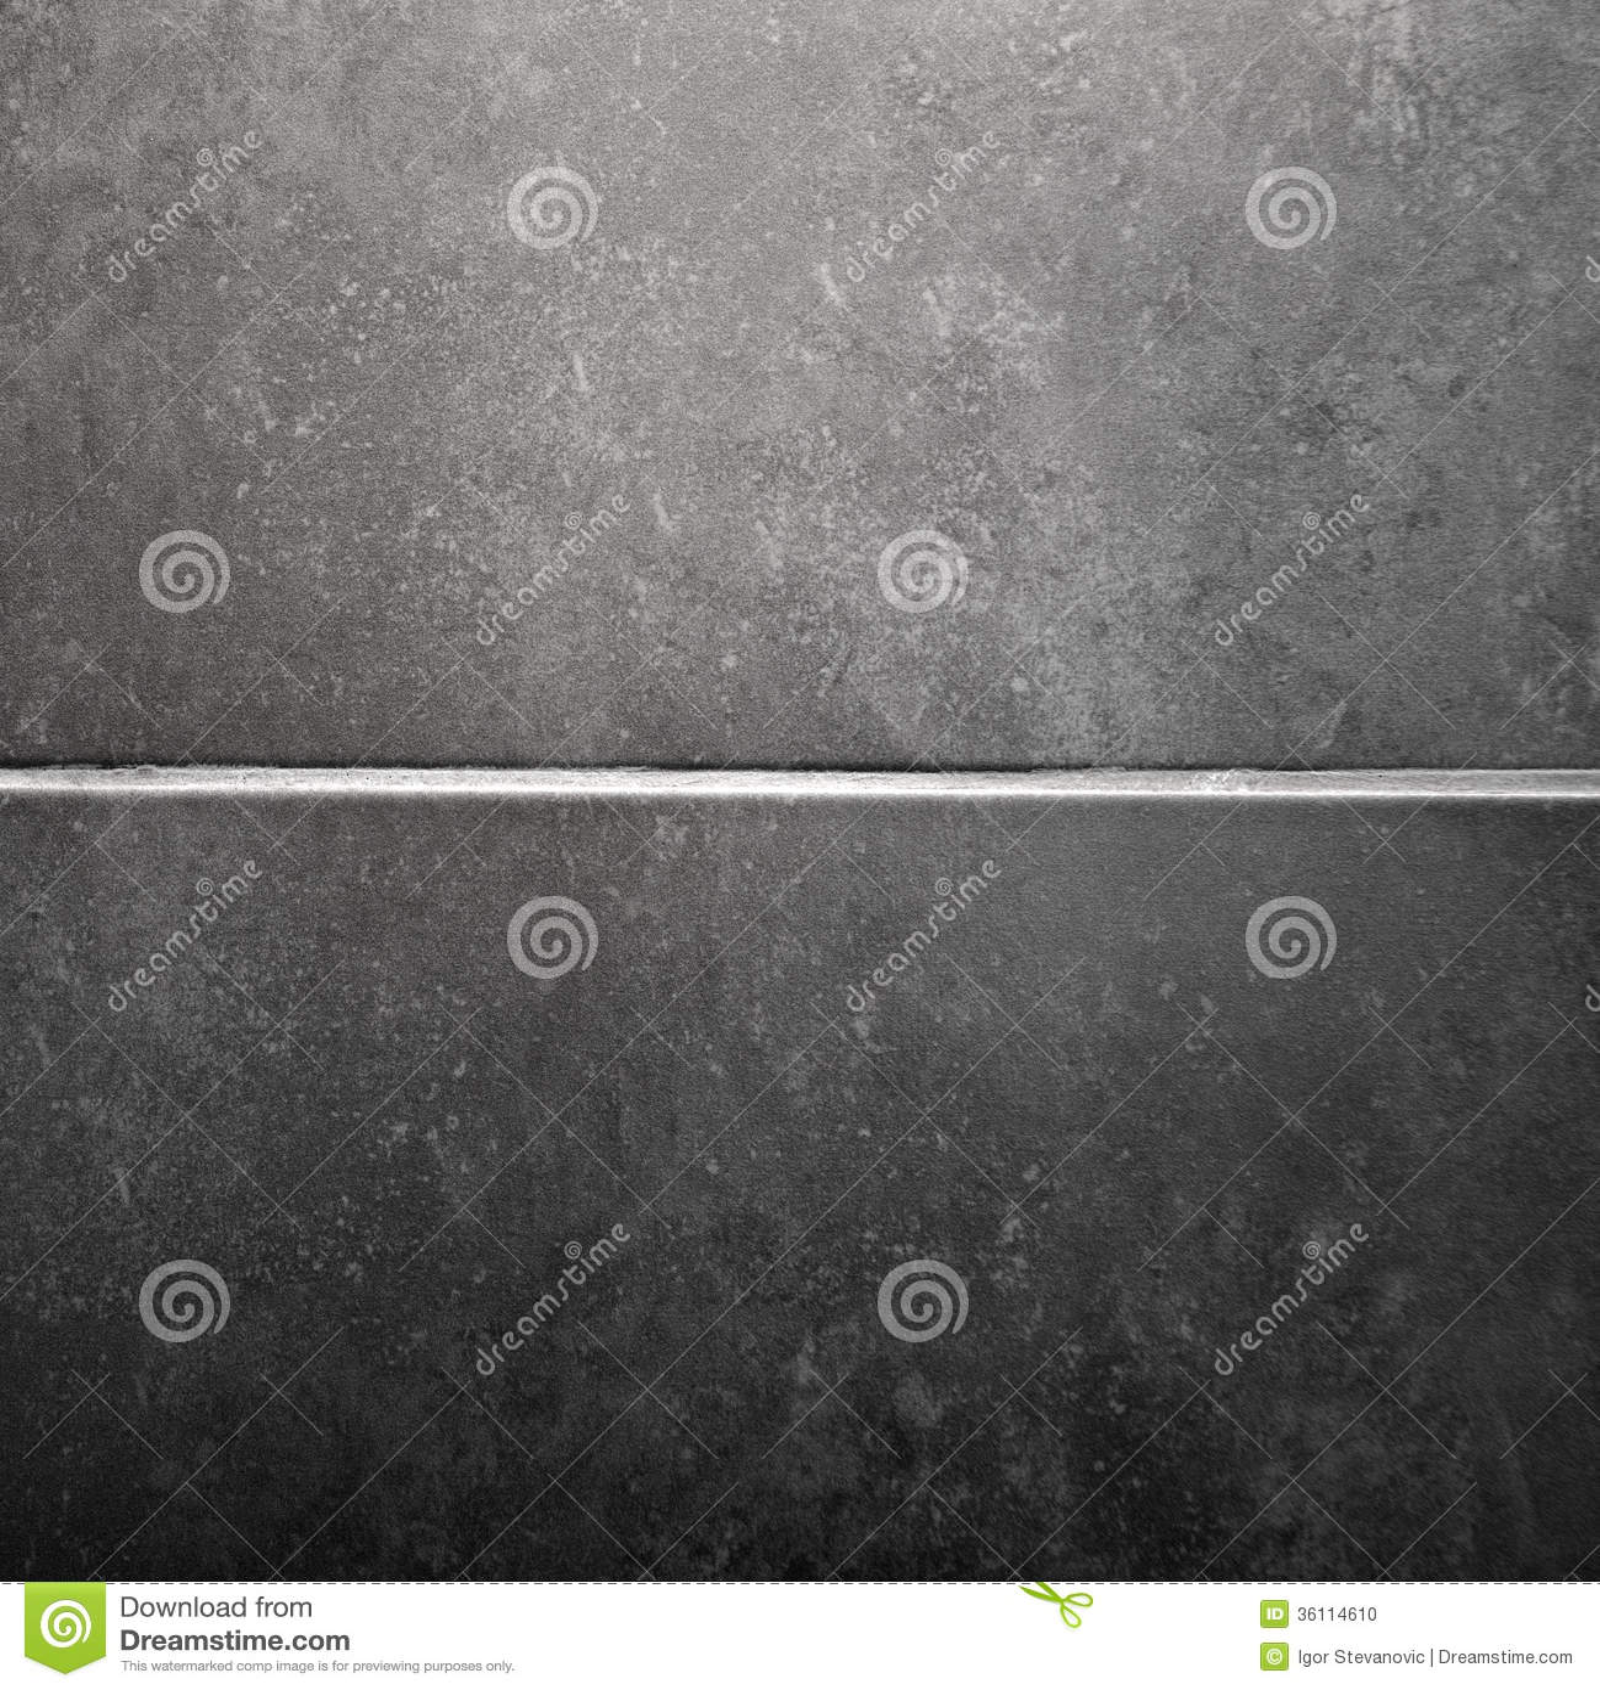 Ceramic Tiles Texture Beige Mosaic Ceramic Tiles For Wall Or Fl